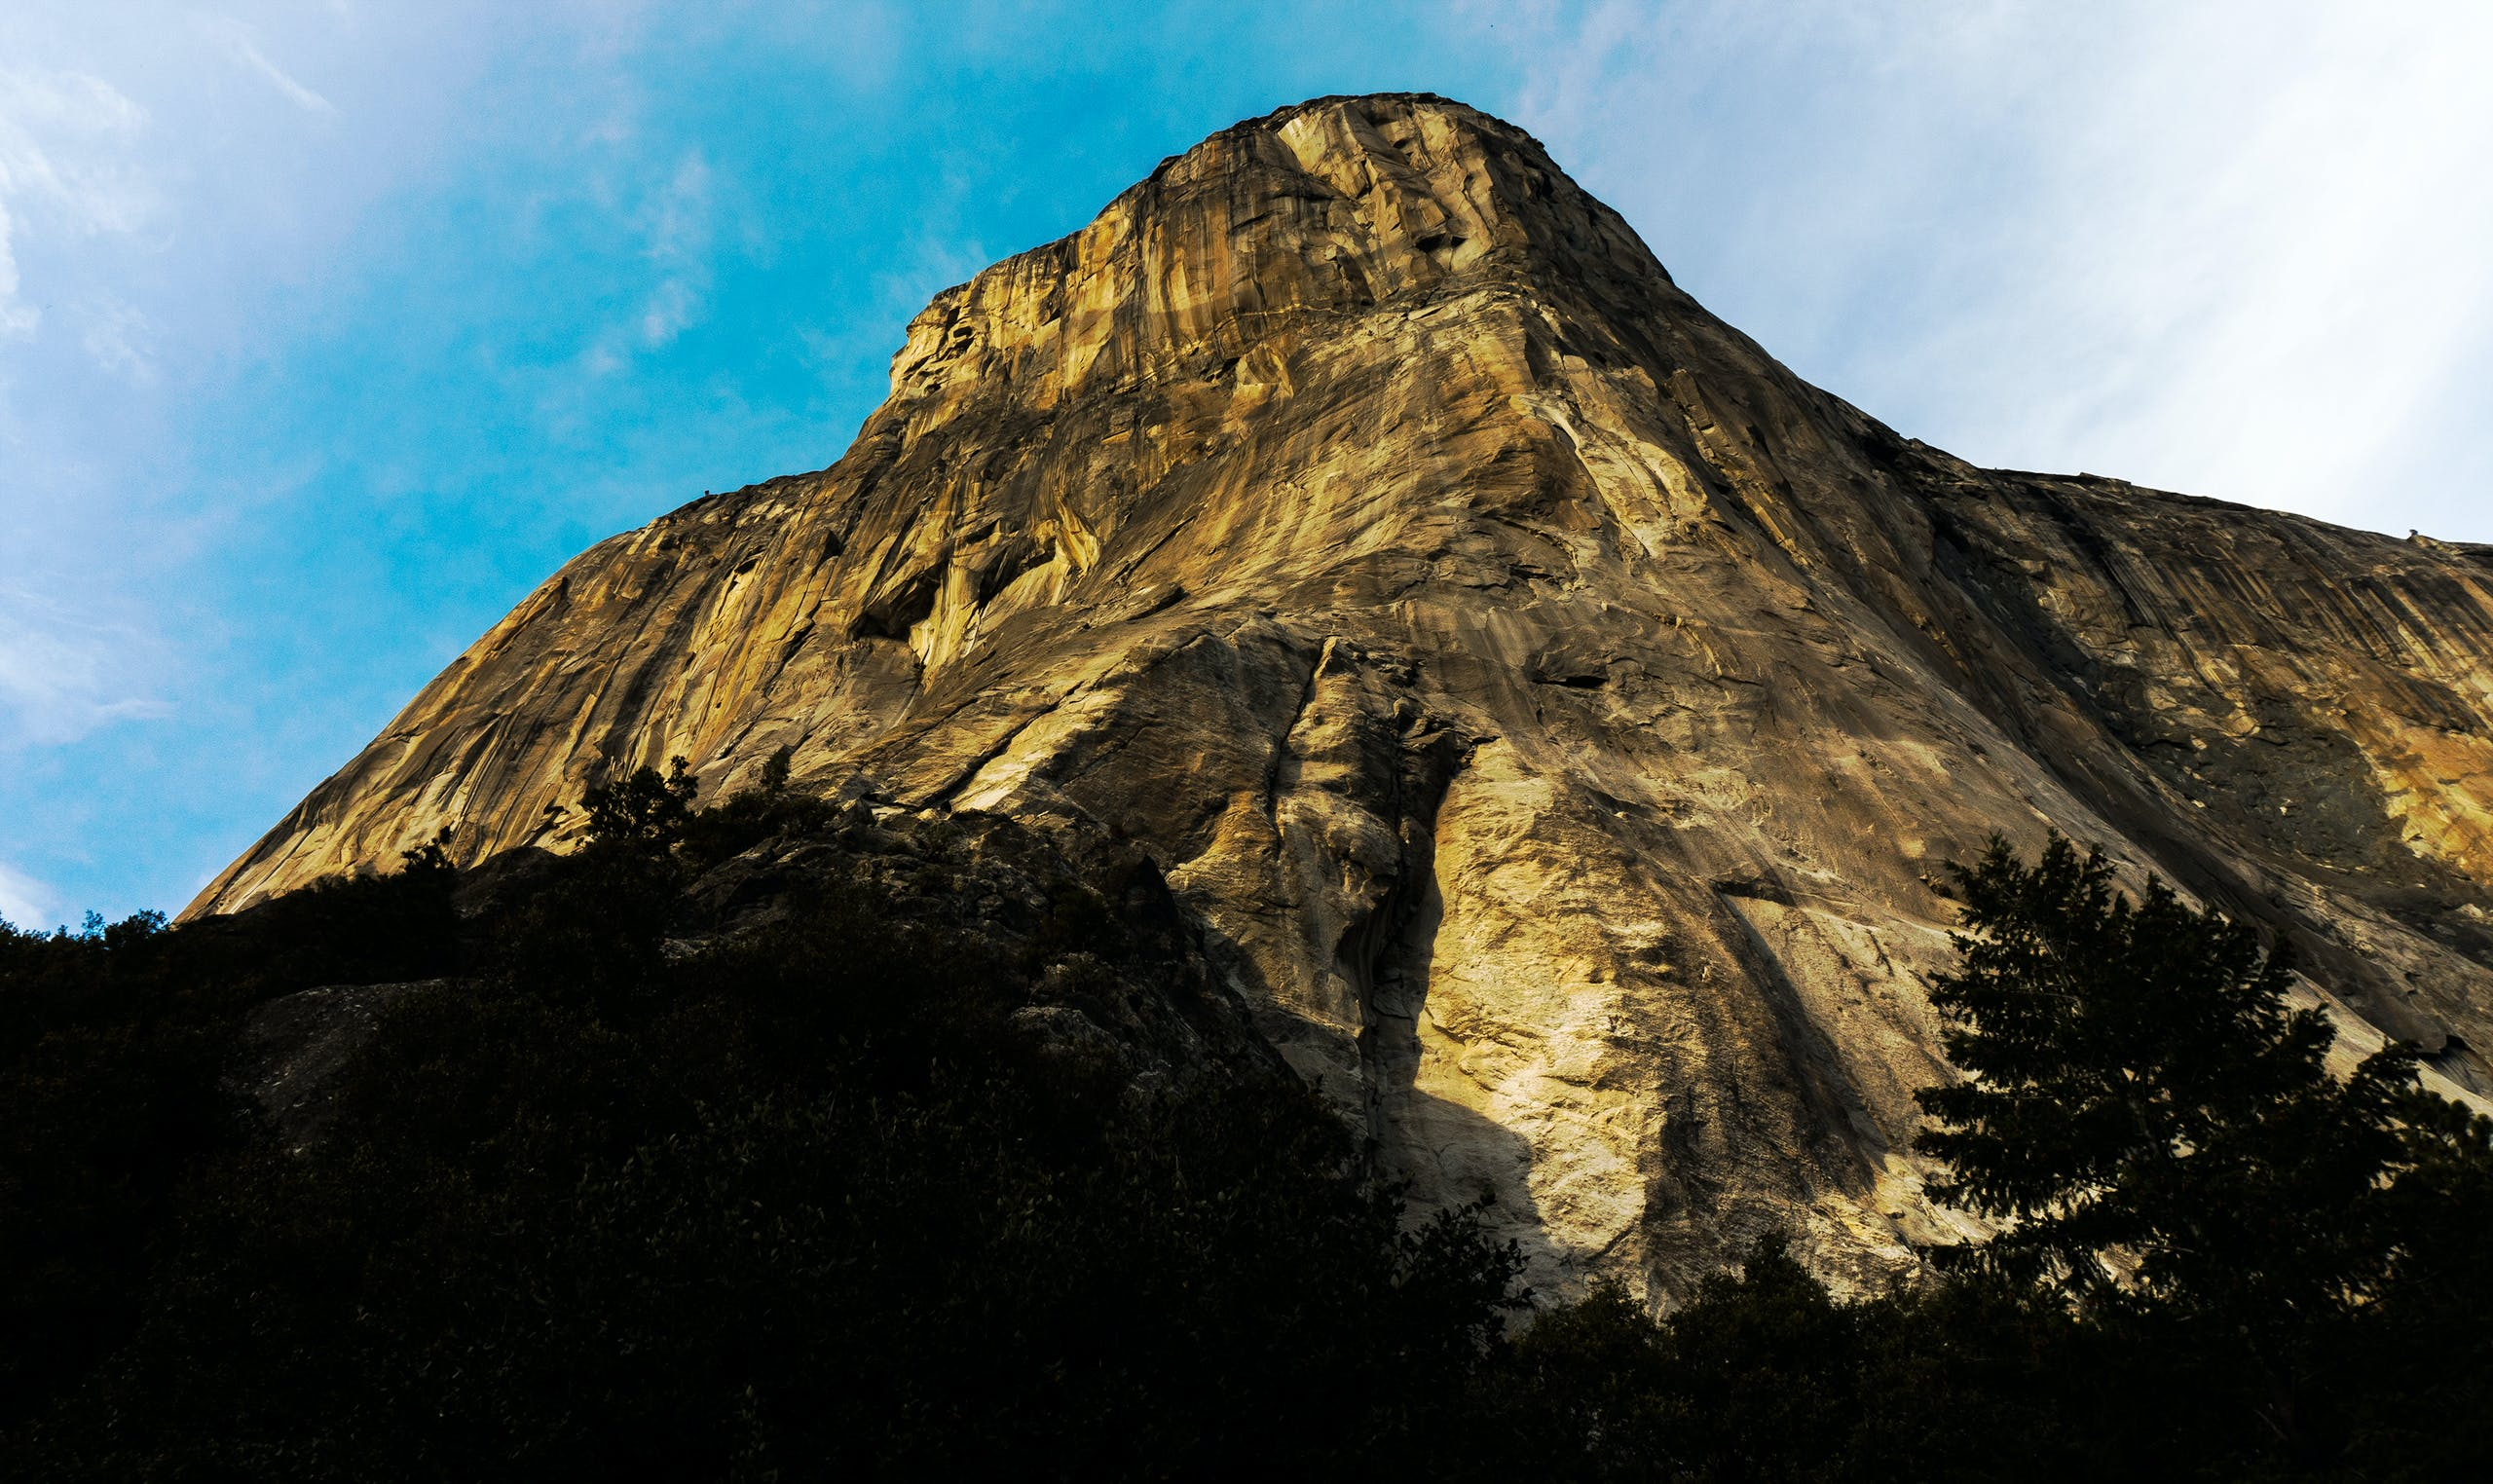 Free stock photo of cliffside, el capitan, rock climbing, rocky mountain